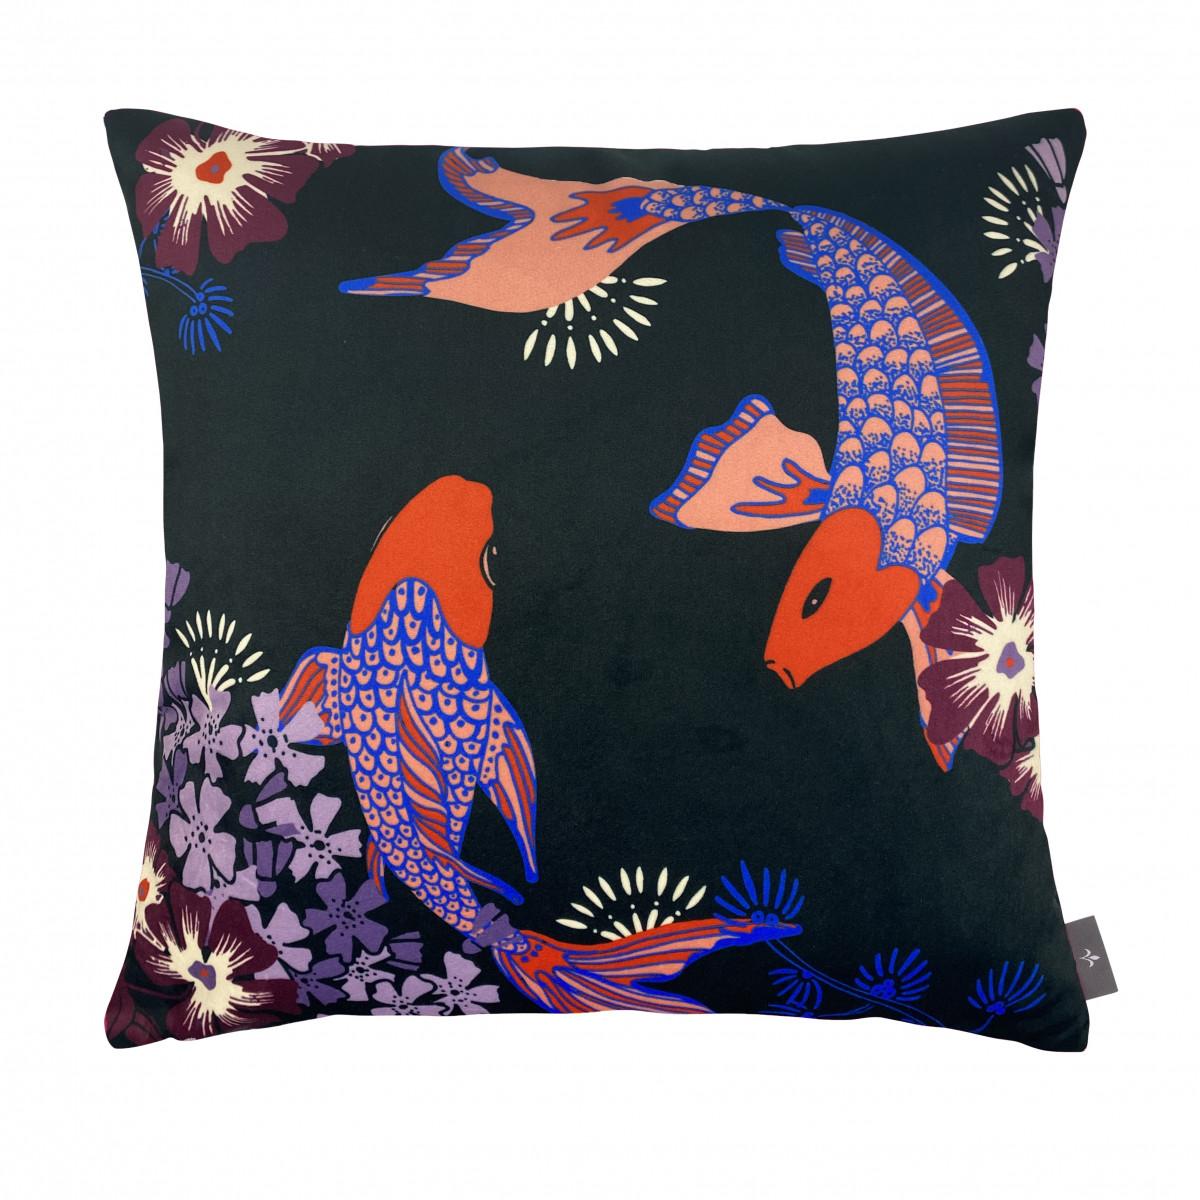 Coussin imprimé les poissons koï made in france violet 47x47